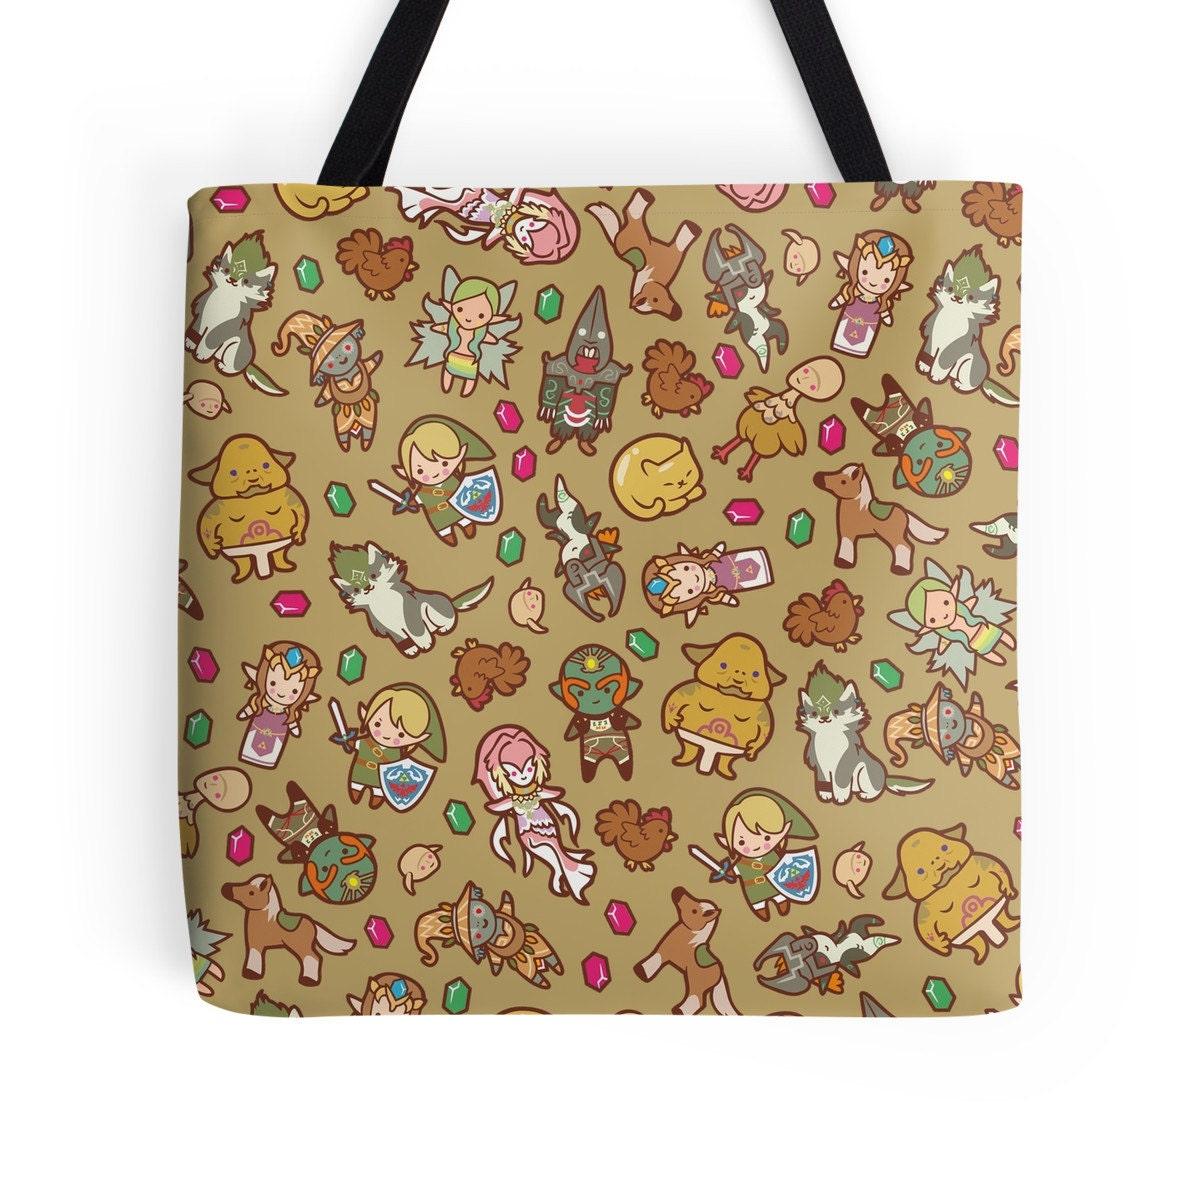 Twilight Princess Pattern  The Legend of Zelda Twilight Princess  Polyester Premium Tote Bag